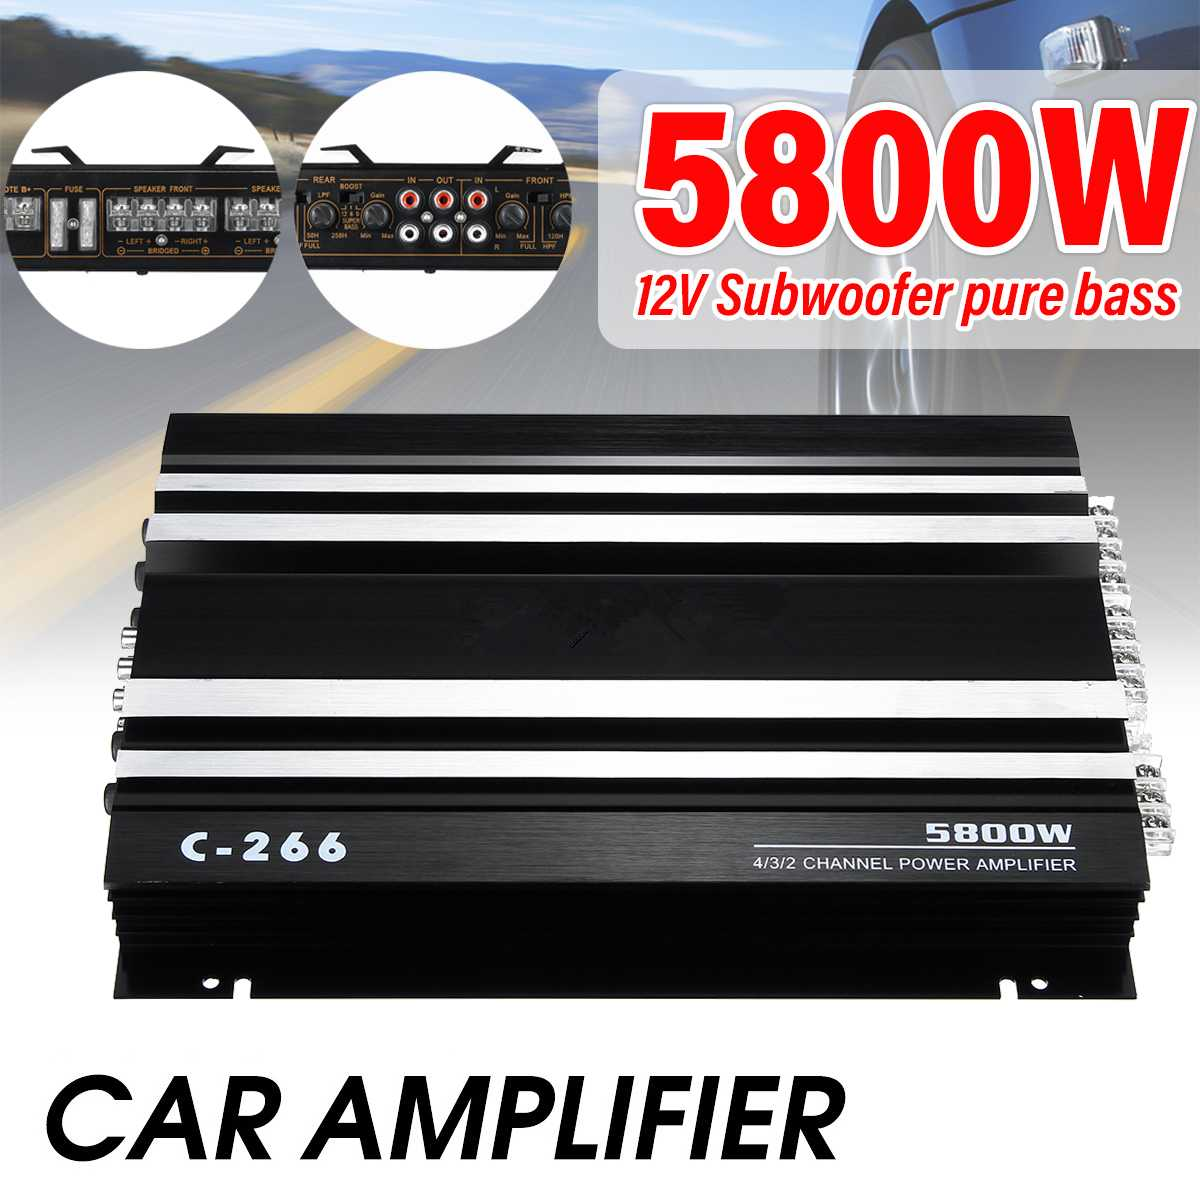 12V 5800W Car Amplifier Multichannel Powerful Car Audio Subwoofer Aluminum Alloy Vehicle Power Stereo Amp Car Sound Amplifiers